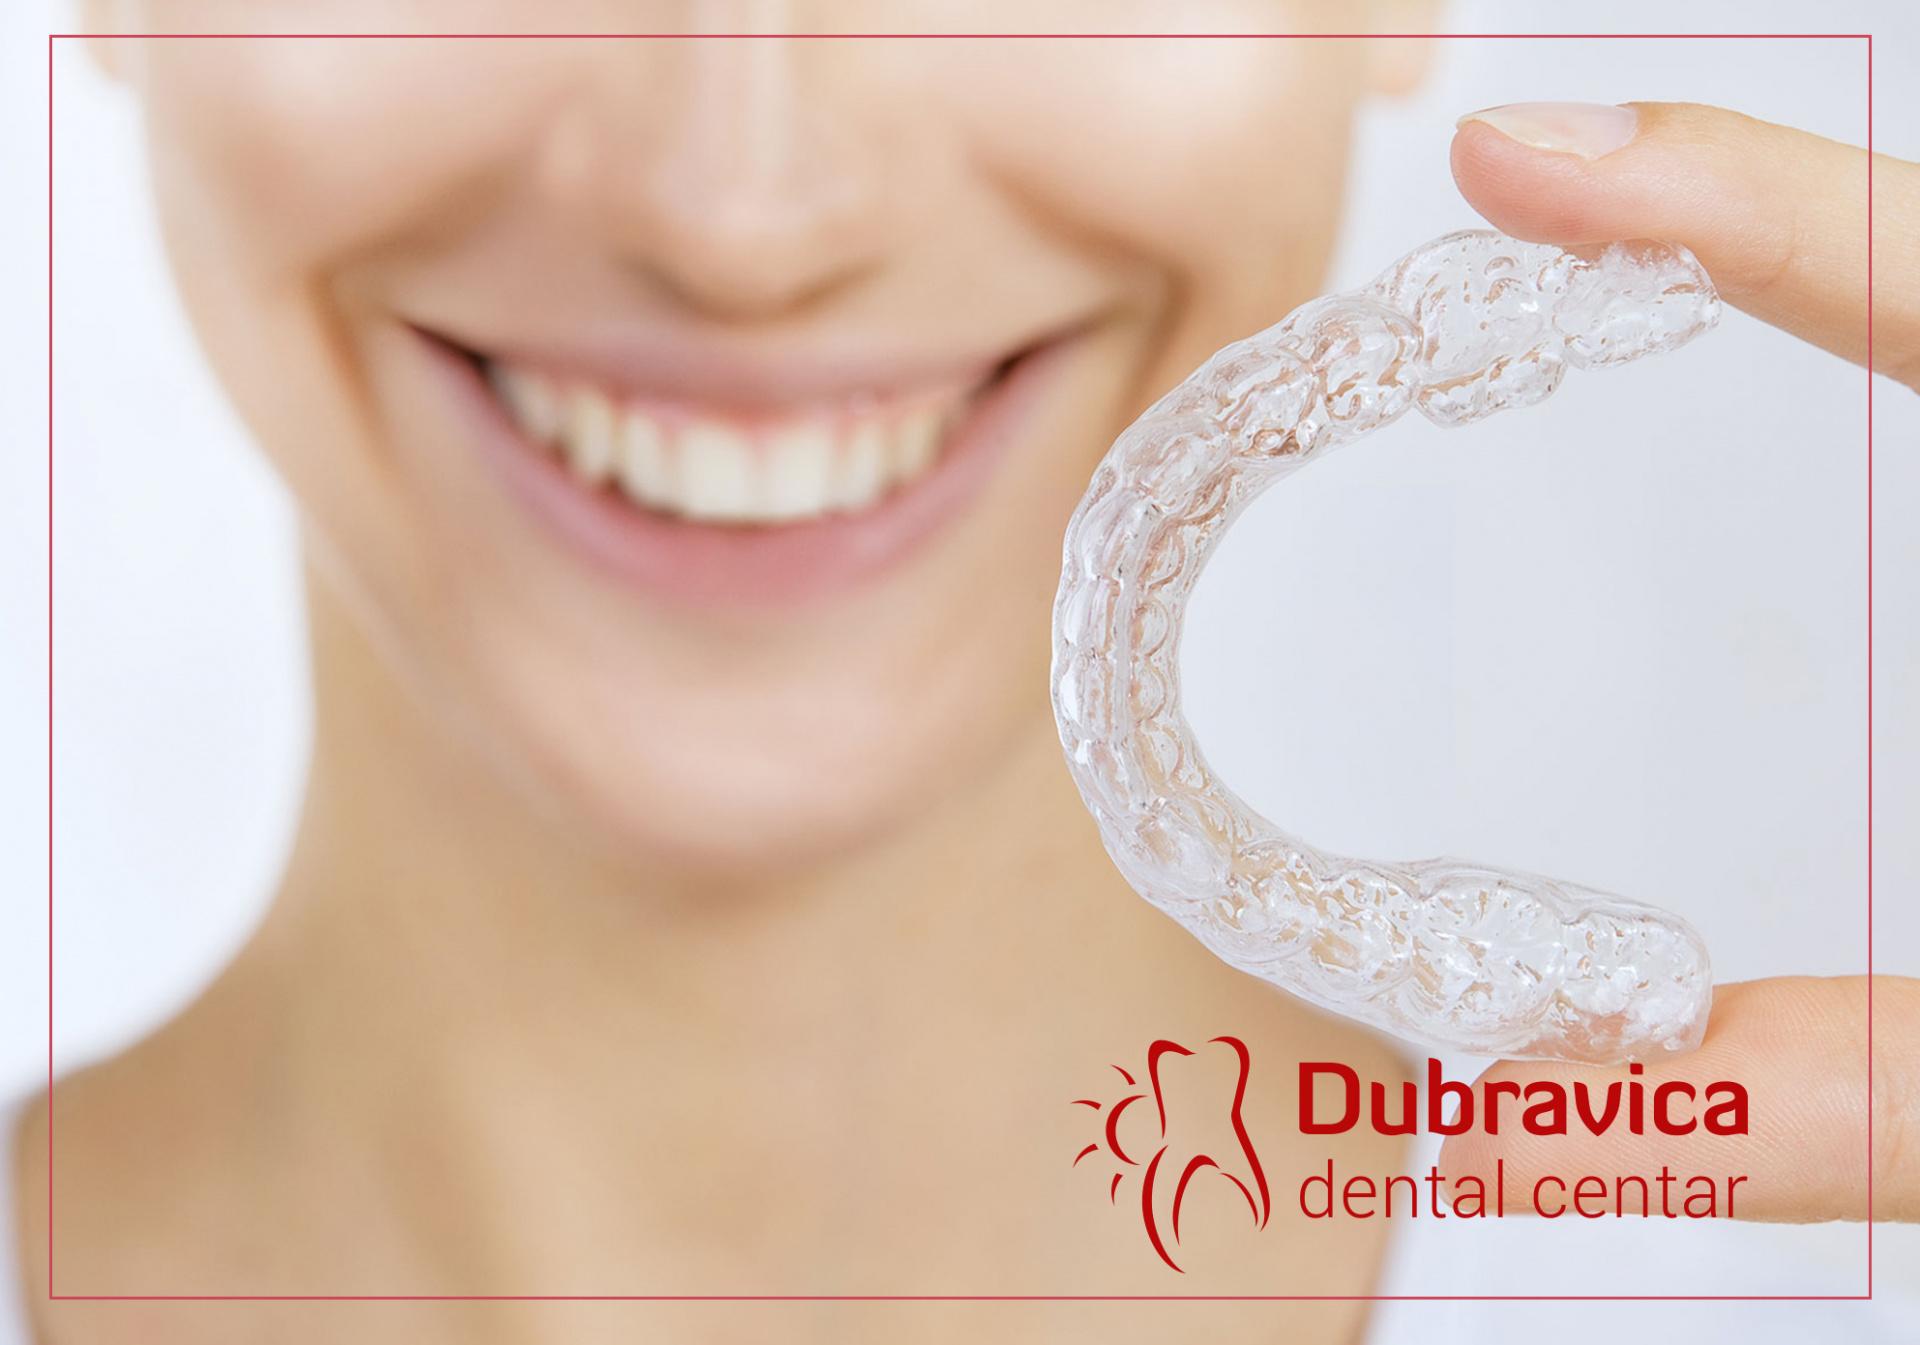 Pitajte ortodonta